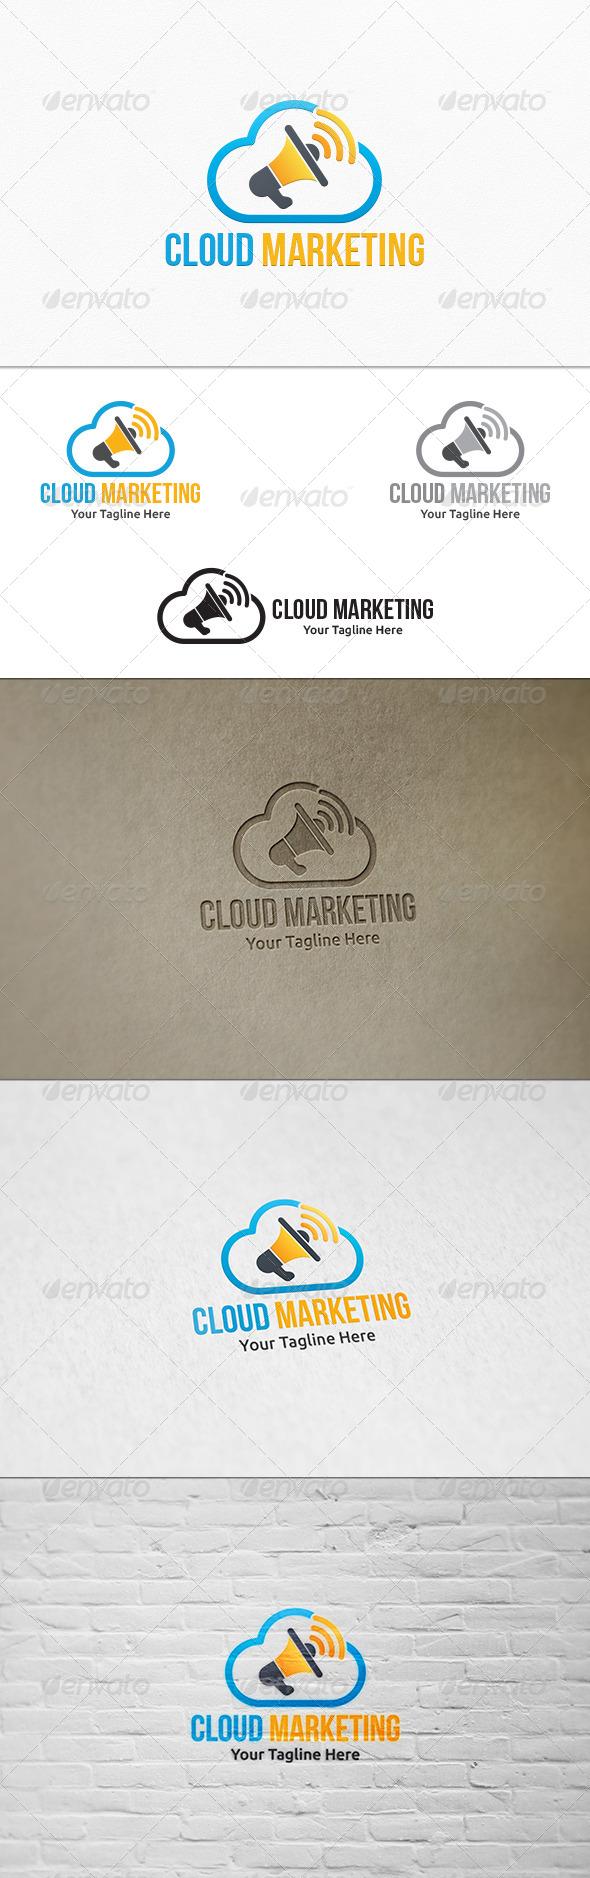 GraphicRiver Cloud Marketing Logo Template 8027873